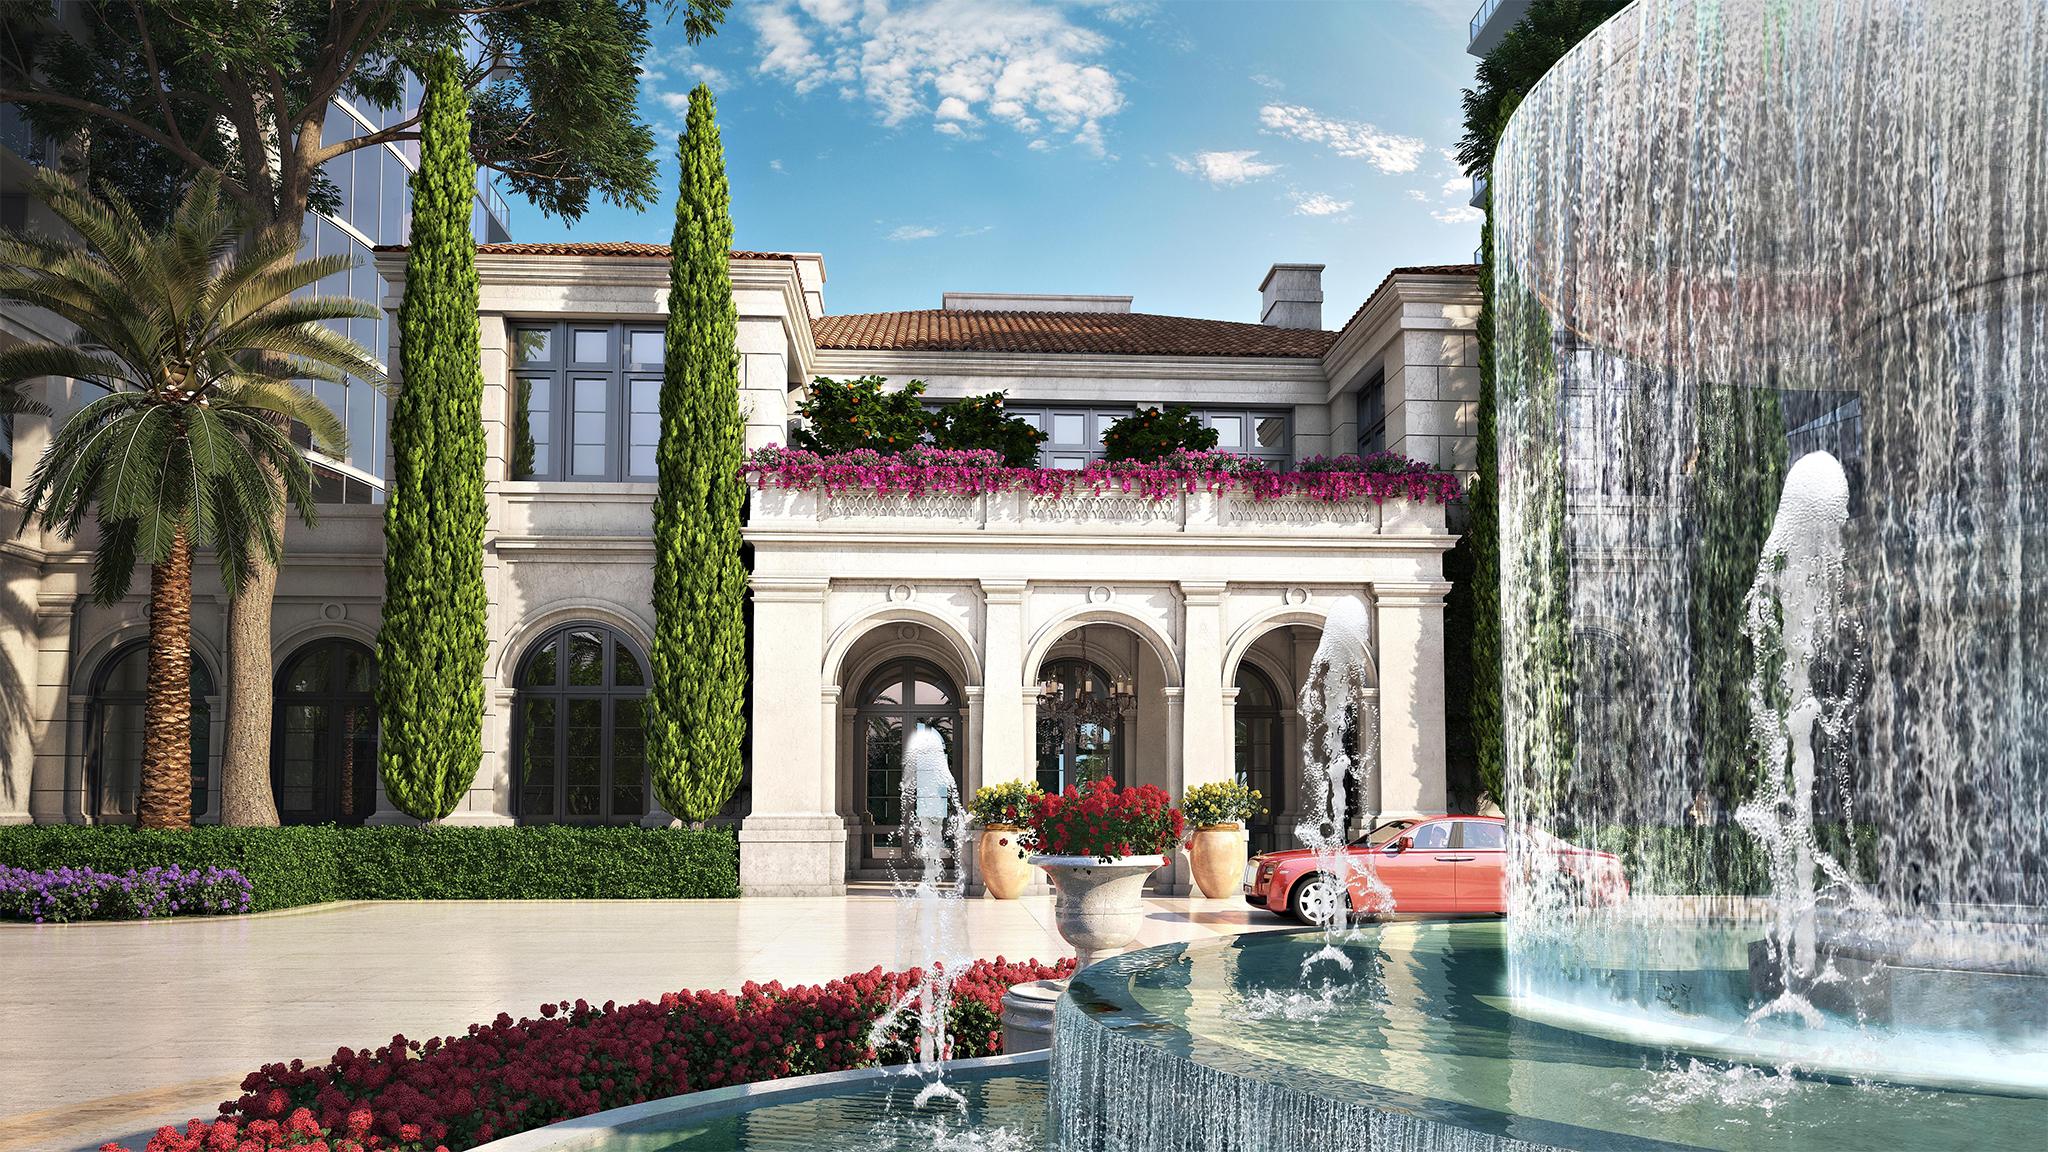 Estates-Acqualina-Villa-Front-with-Fountain